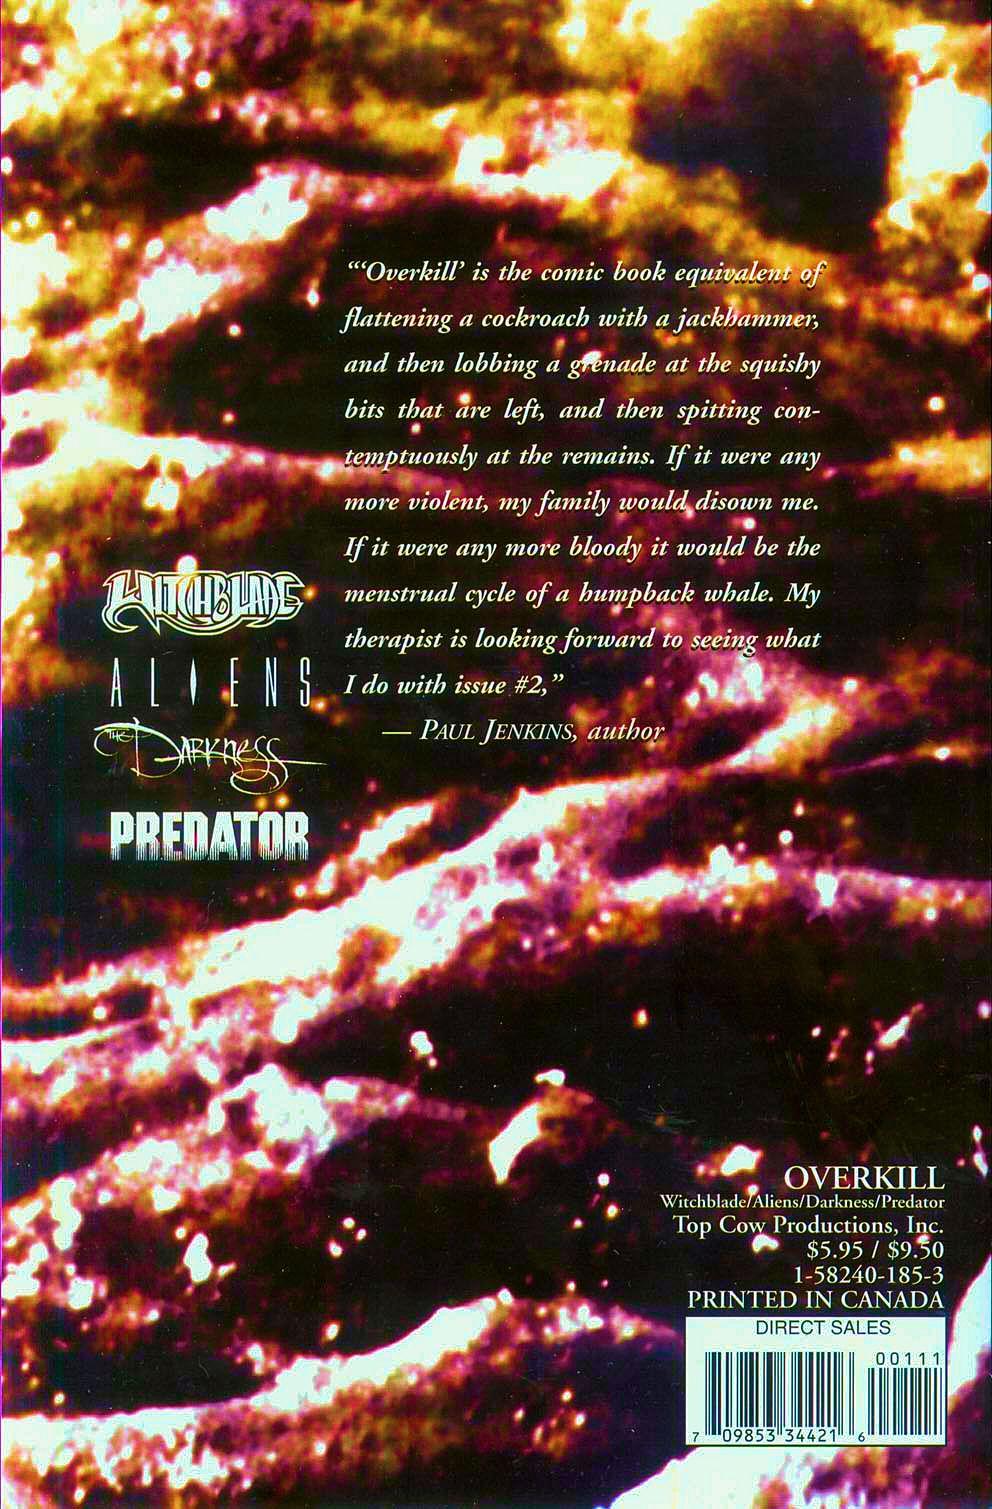 Read online Overkill: Witchblade/Aliens/Darkness/Predator comic -  Issue #1 - 48